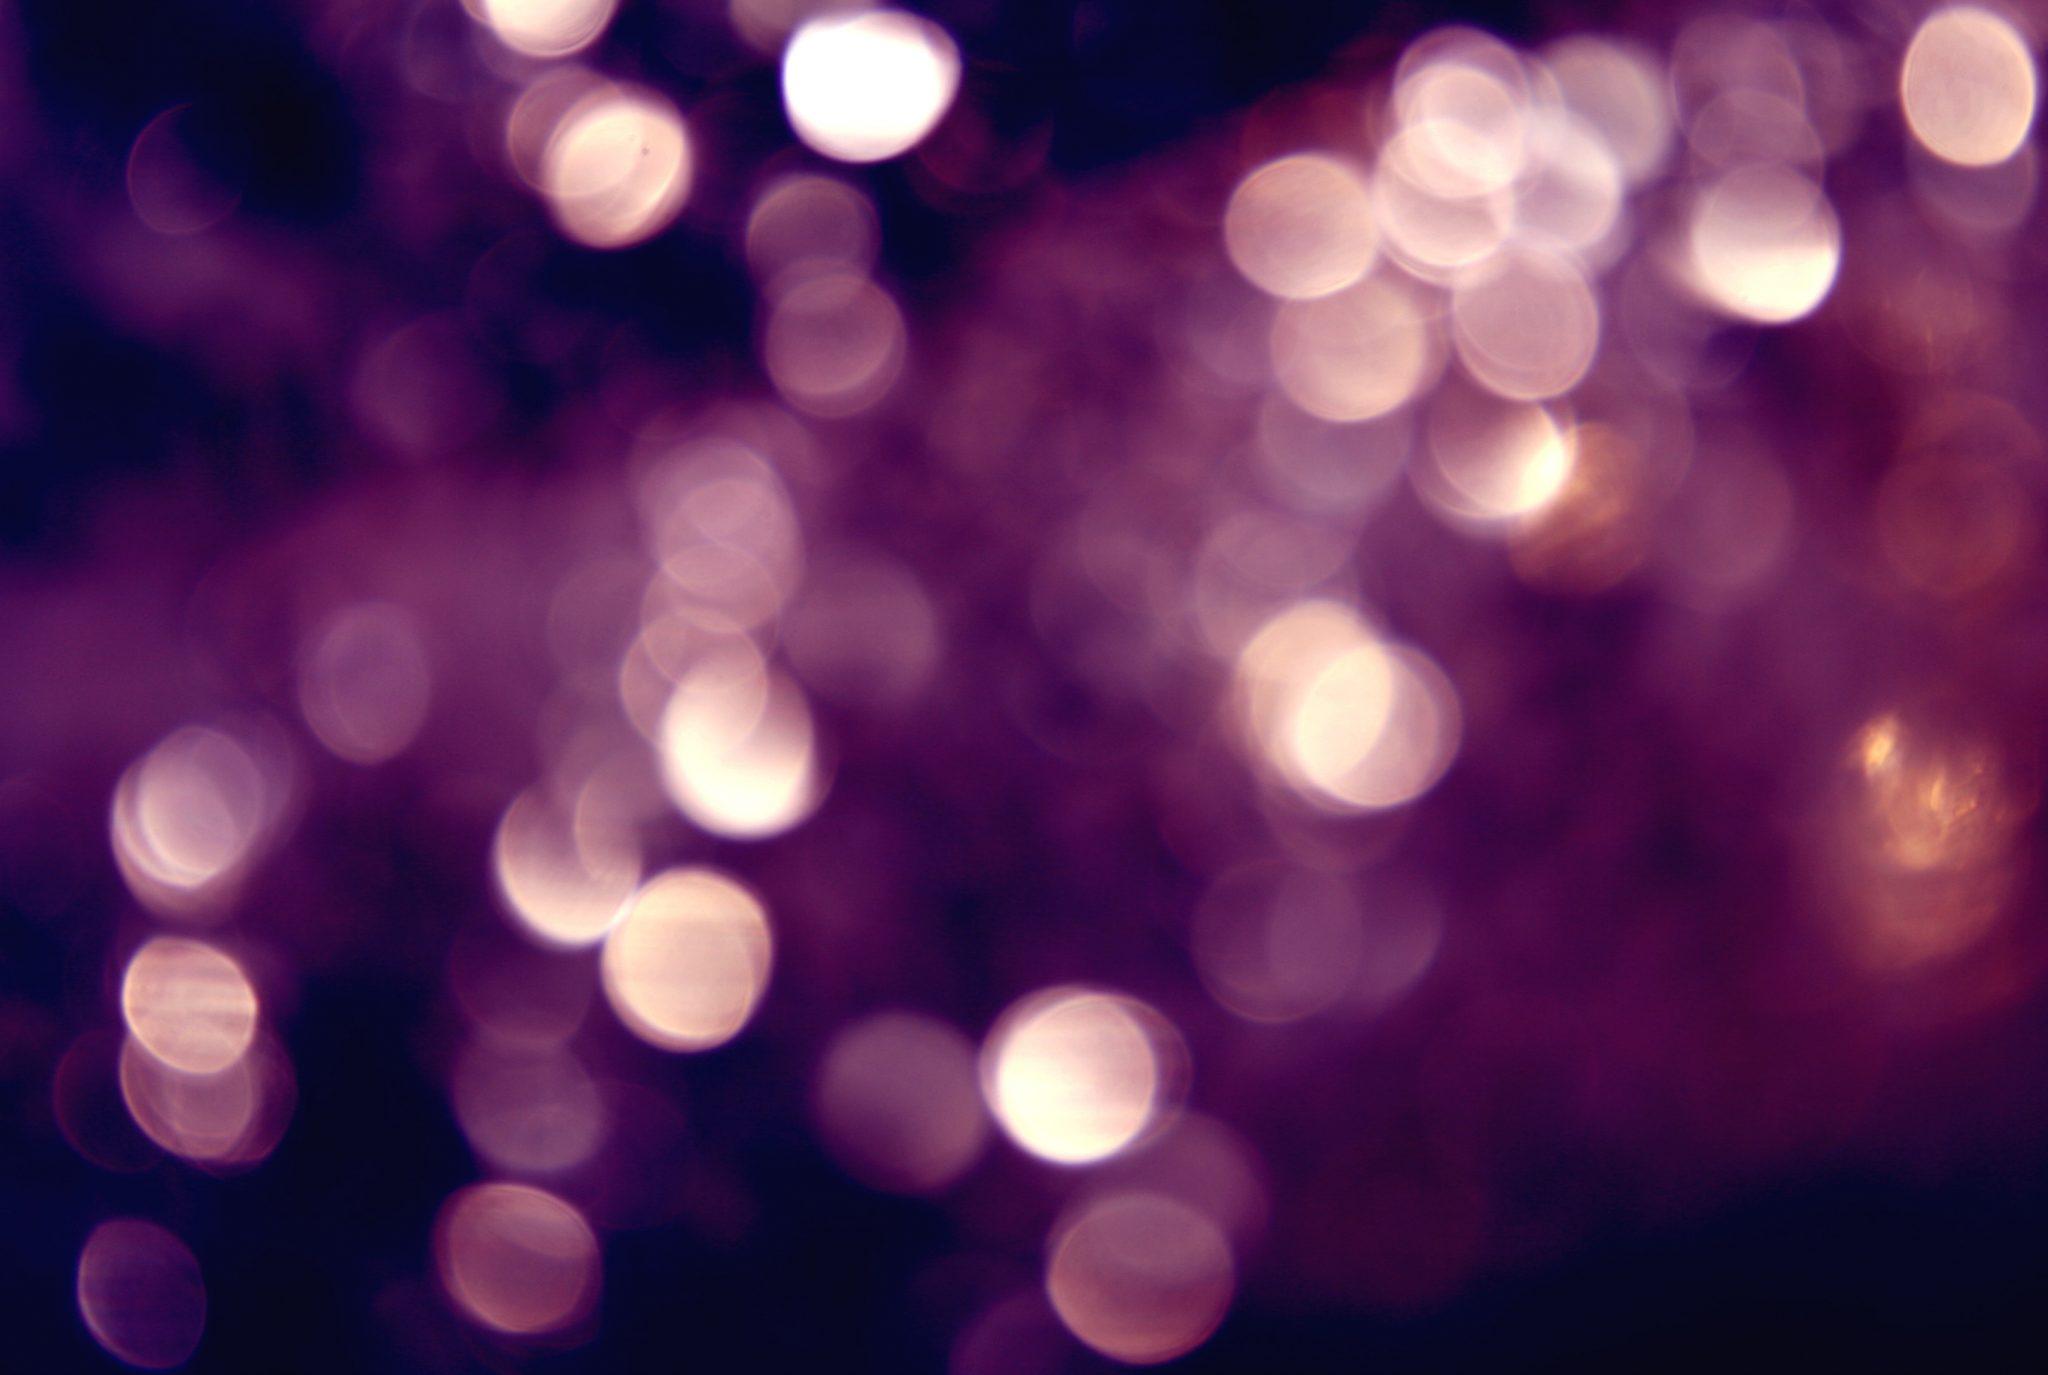 sparkles_2___stock_by_dansch.jpg